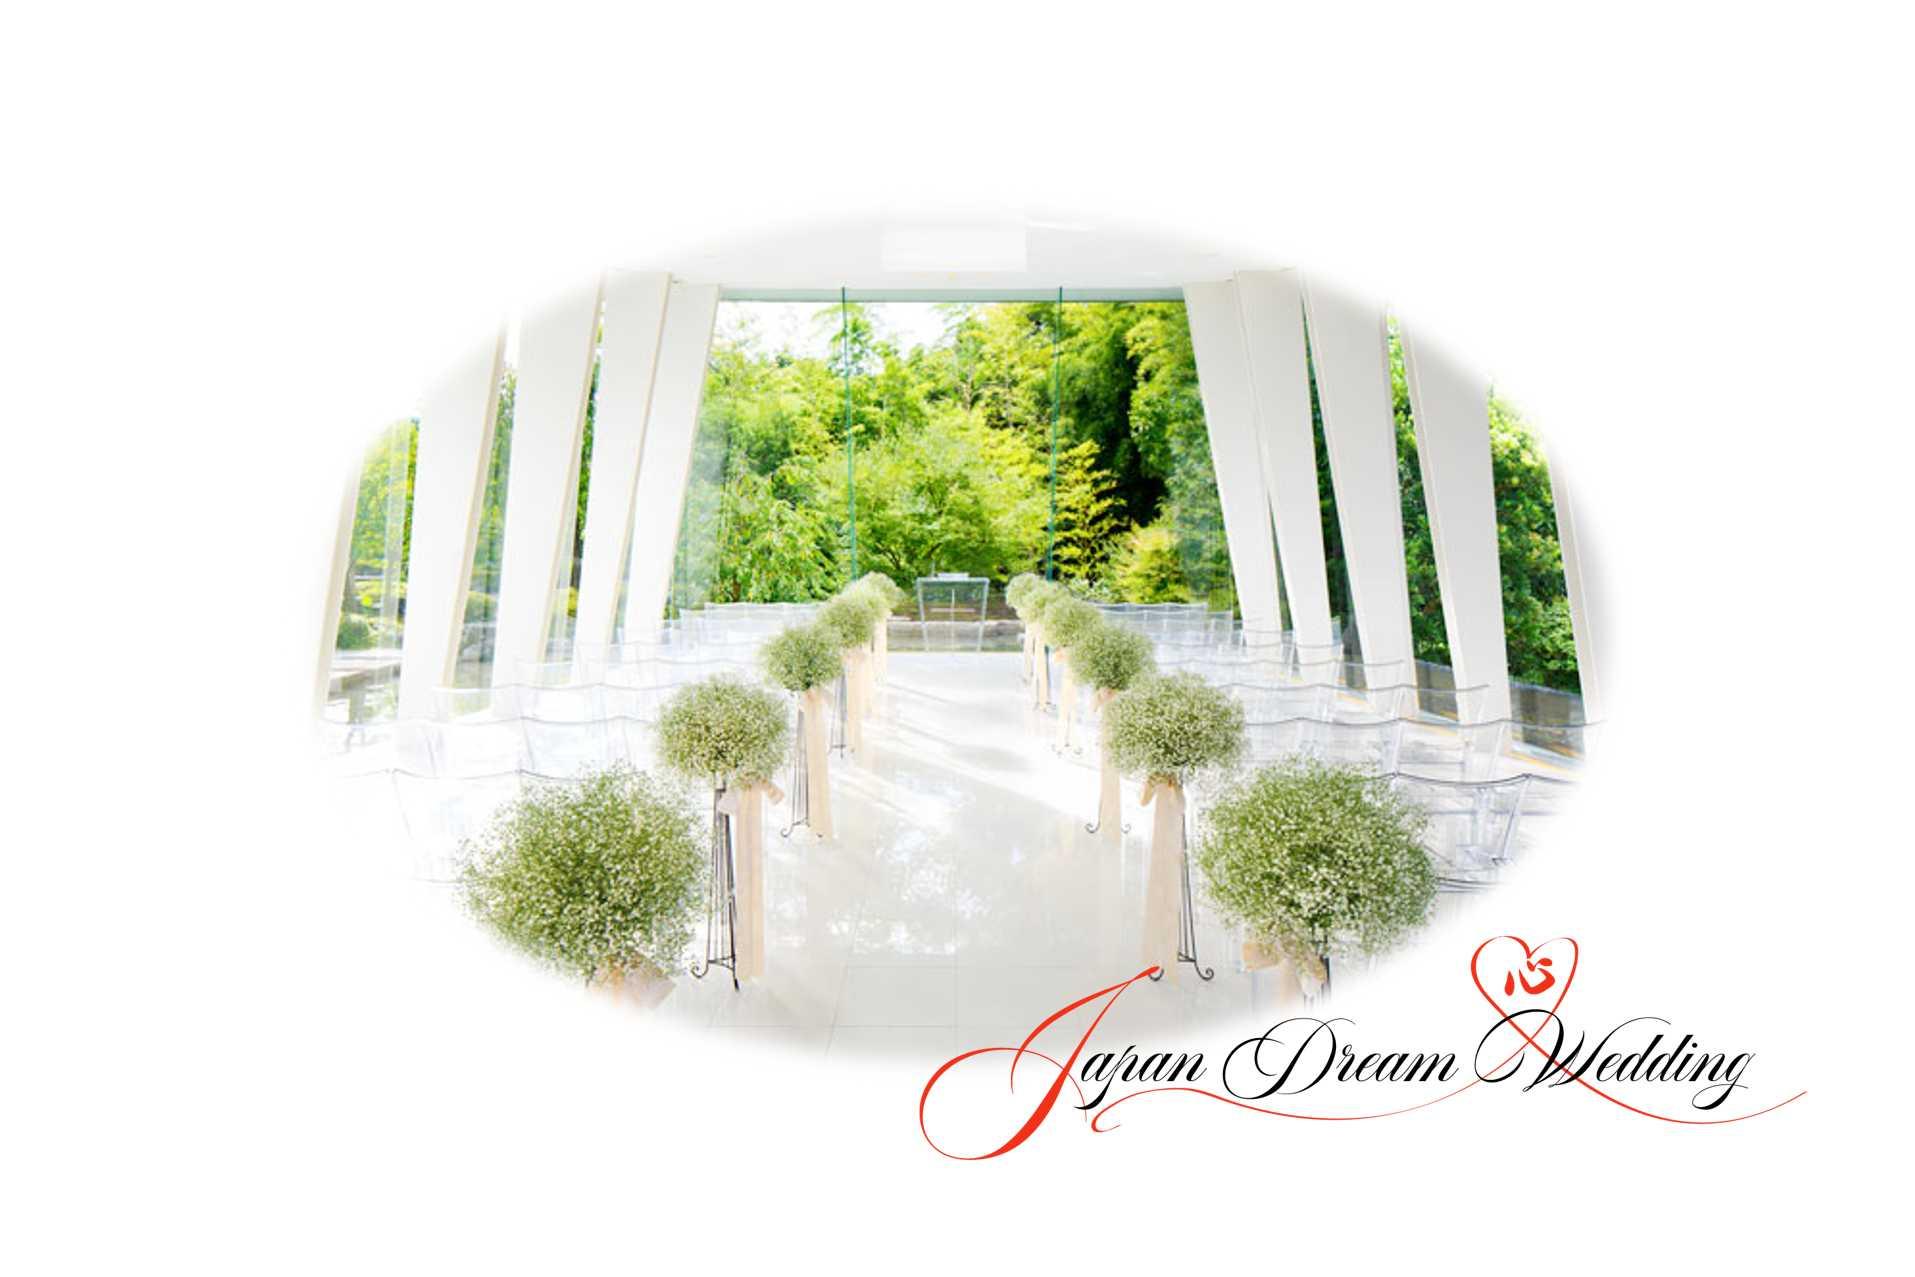 Japan Dream Wedding Chapel Venue